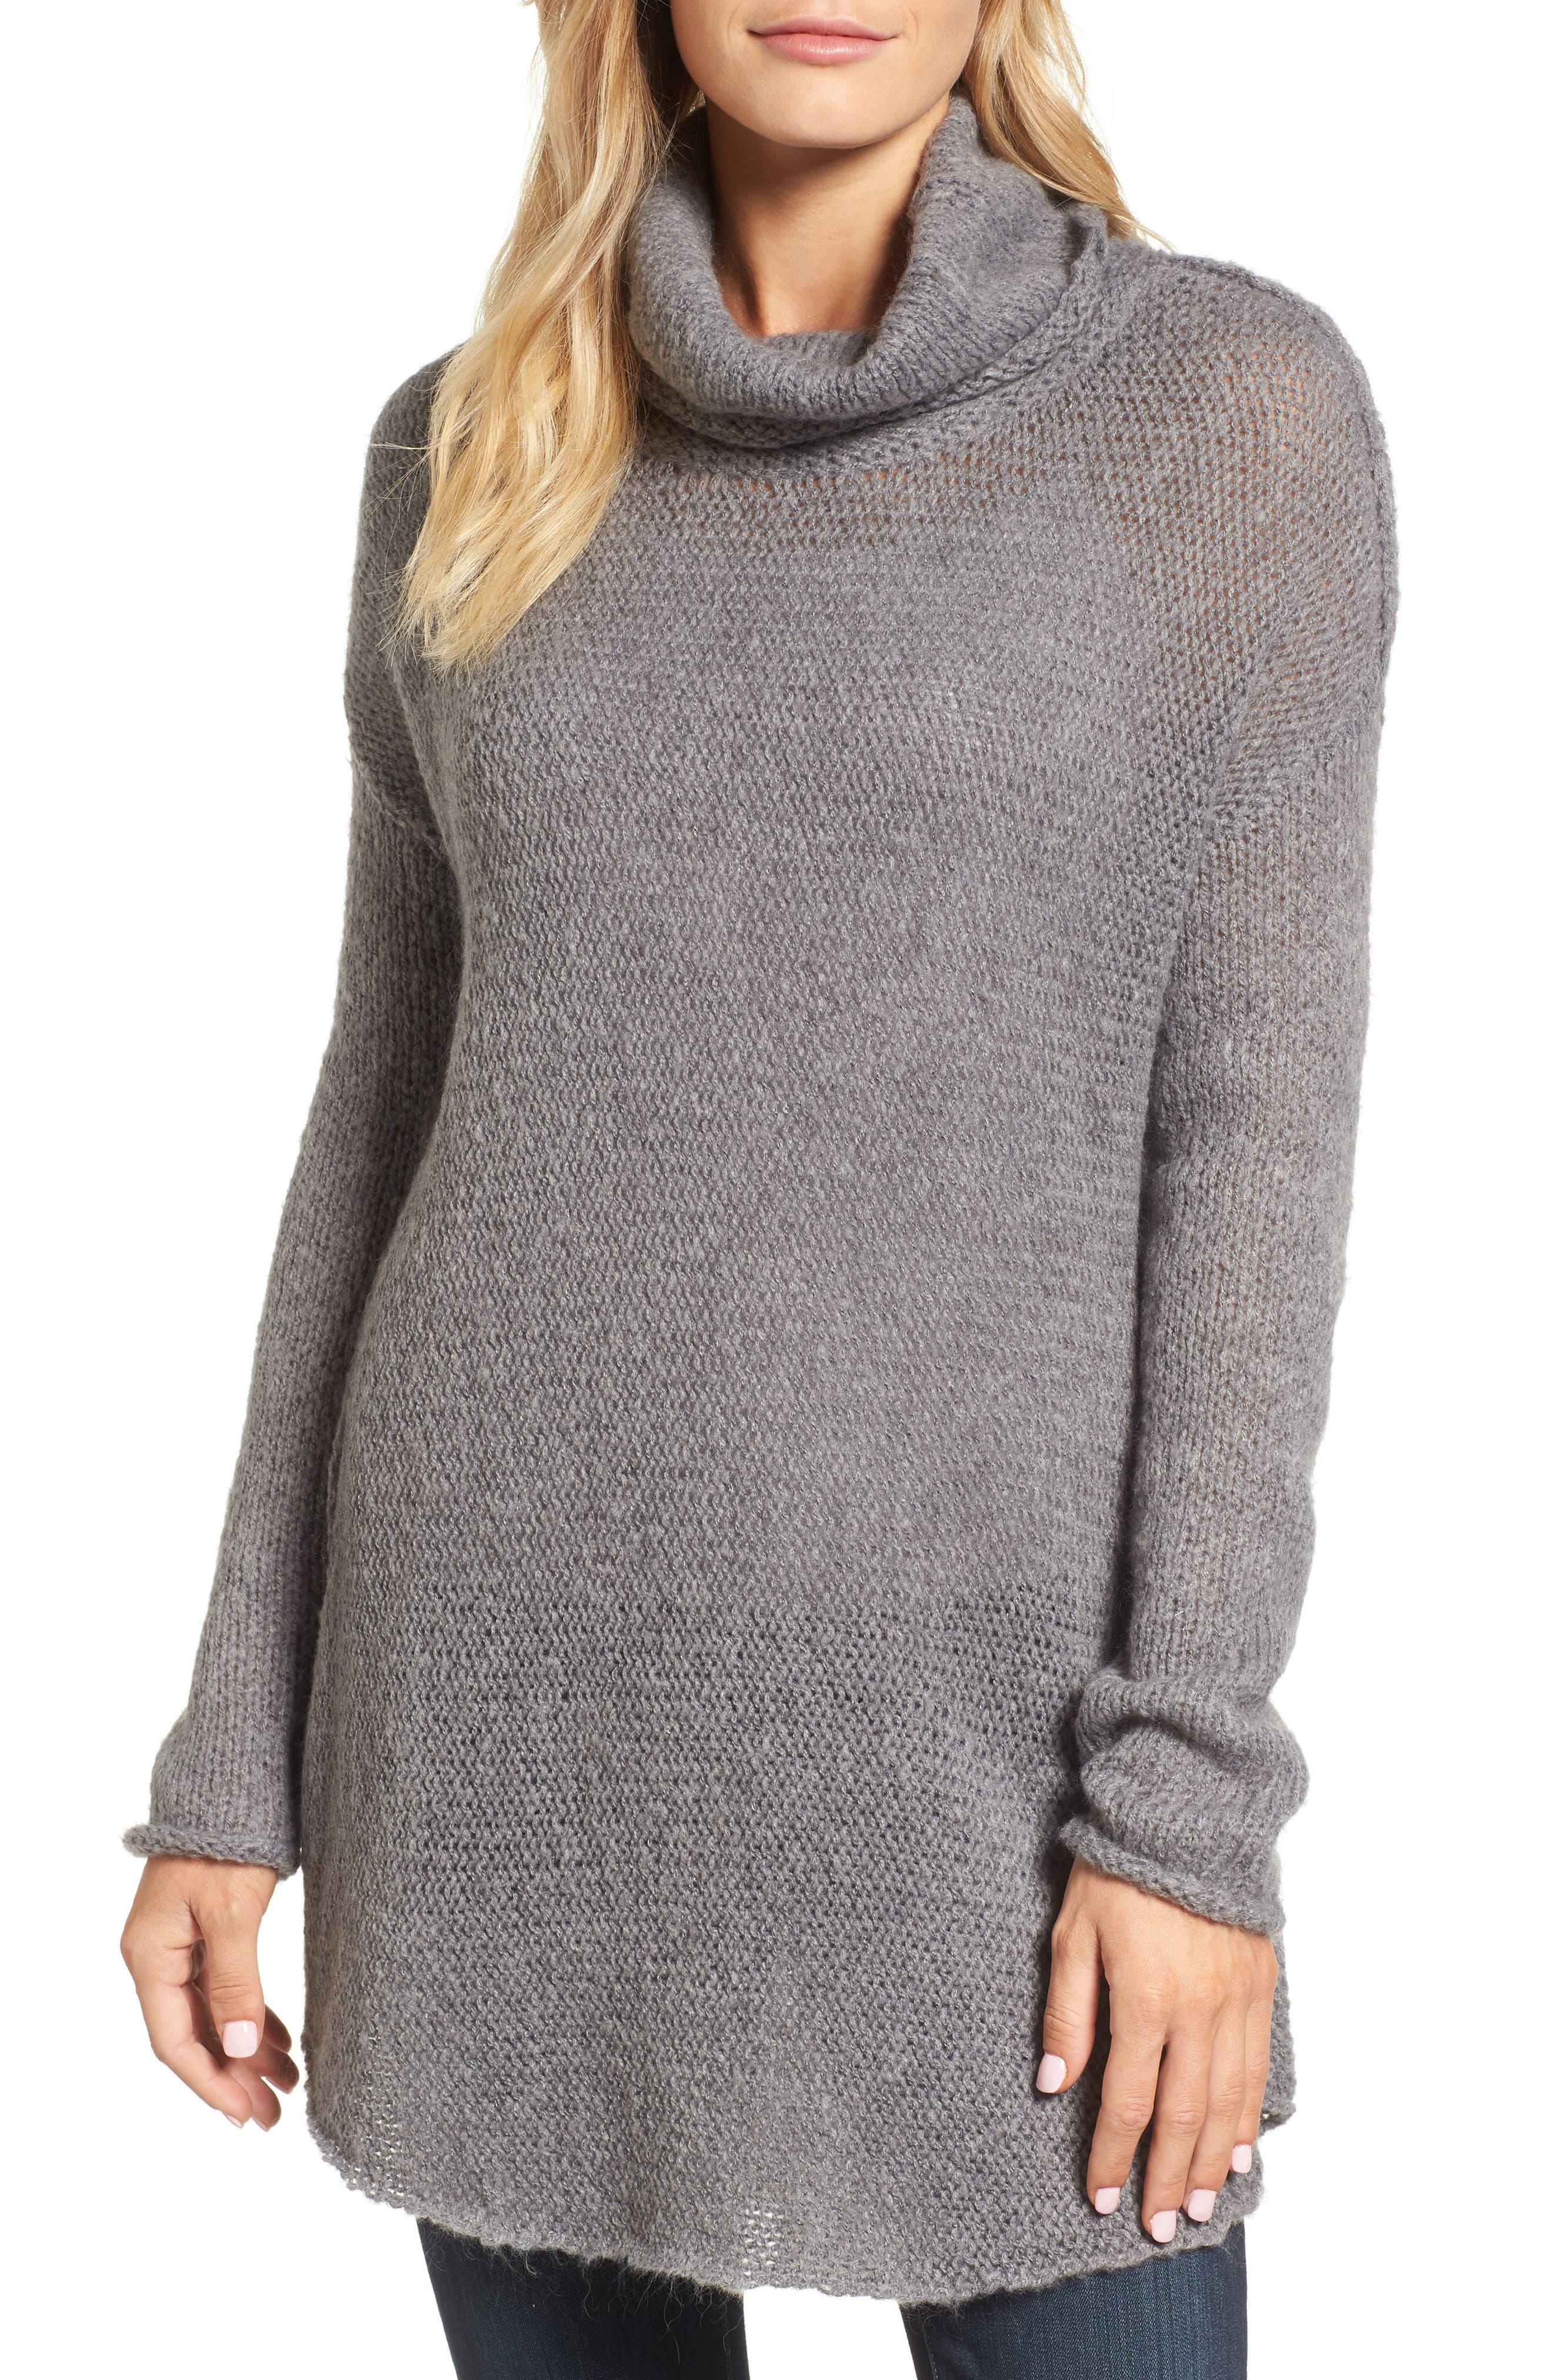 Tunic Sweater,                         Main,                         color, GREY DARK HEATHER